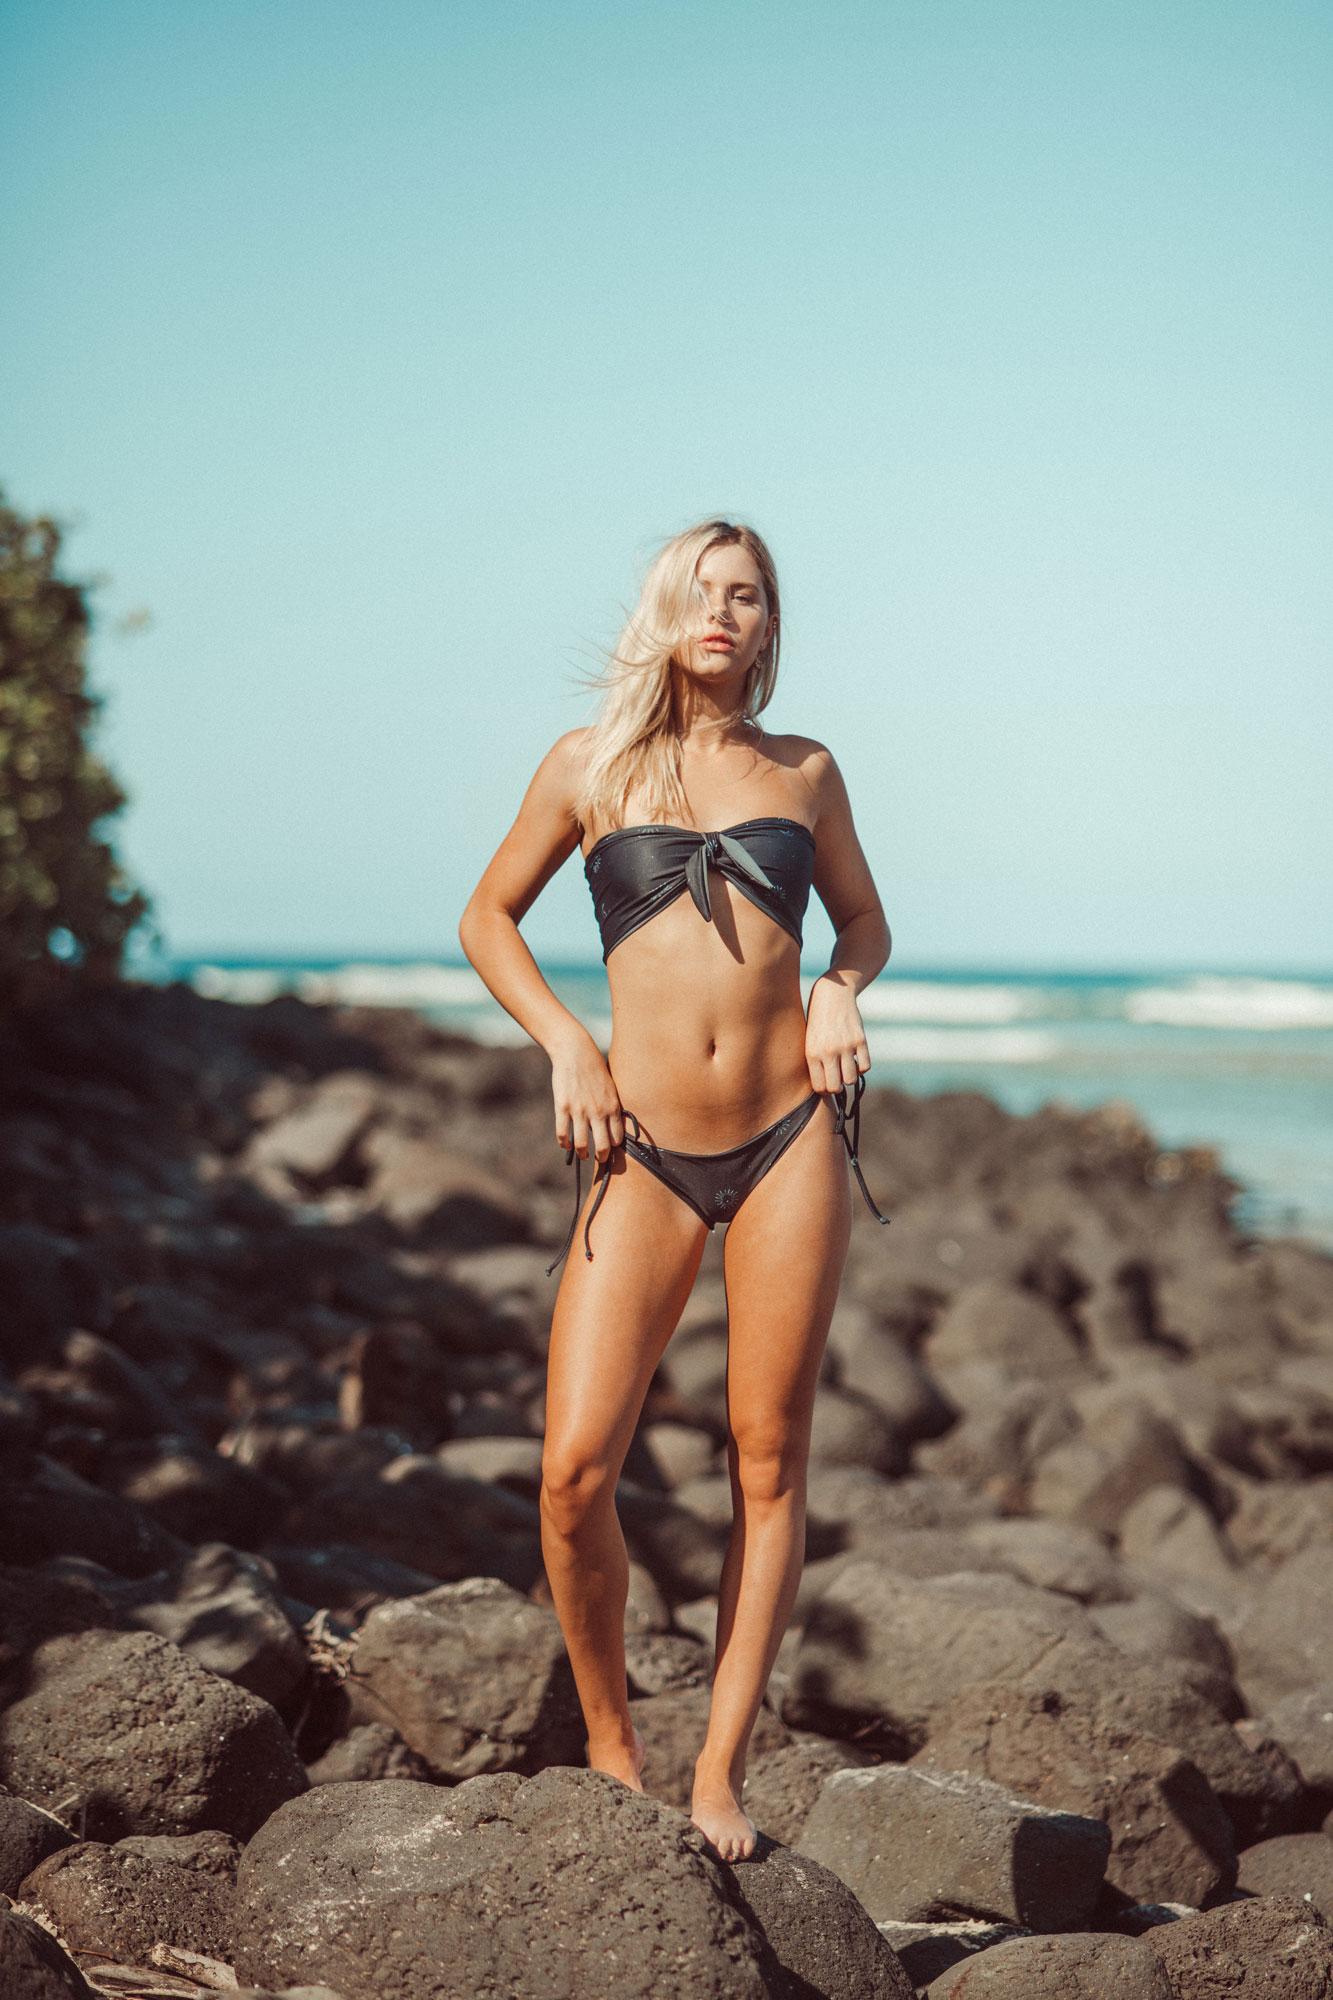 Ethical-Fashion-Swimwear-Lily-Goodare-Gold-Coast-Model-by-Photographer-Kim-Akrigg-in-Liar-the-Label.jpg